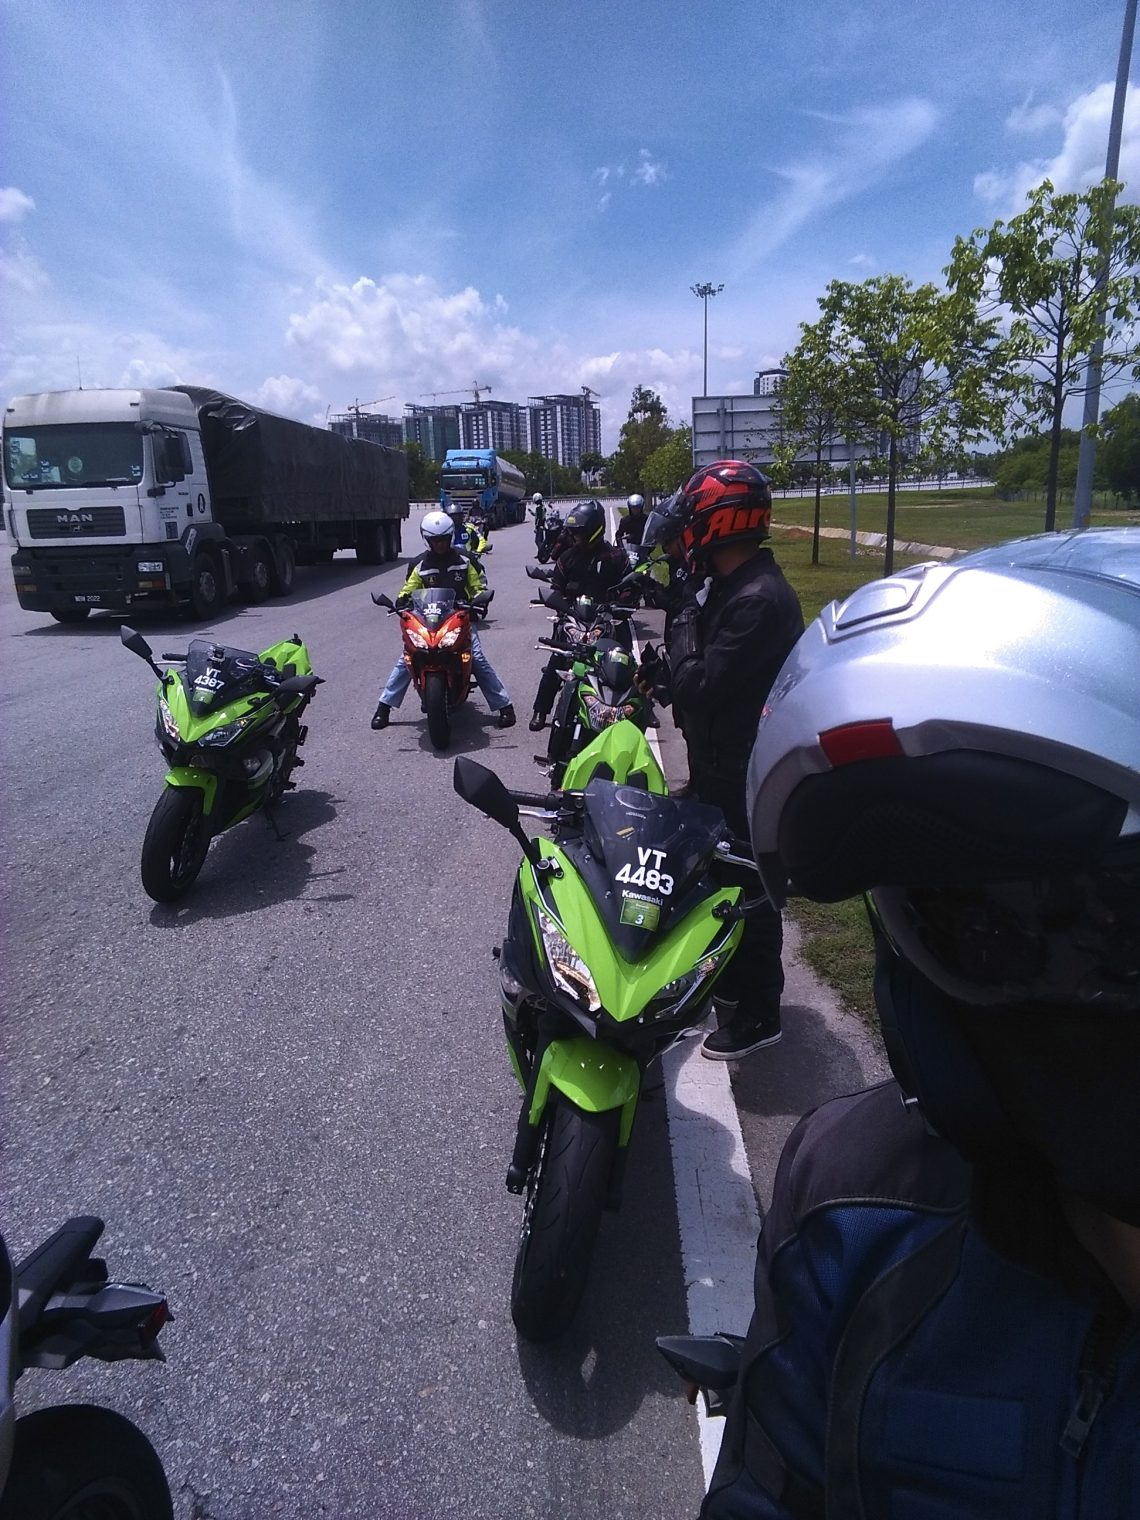 Kawasaki Ninja 650 Z650 Media Test Ride World Tour Rider